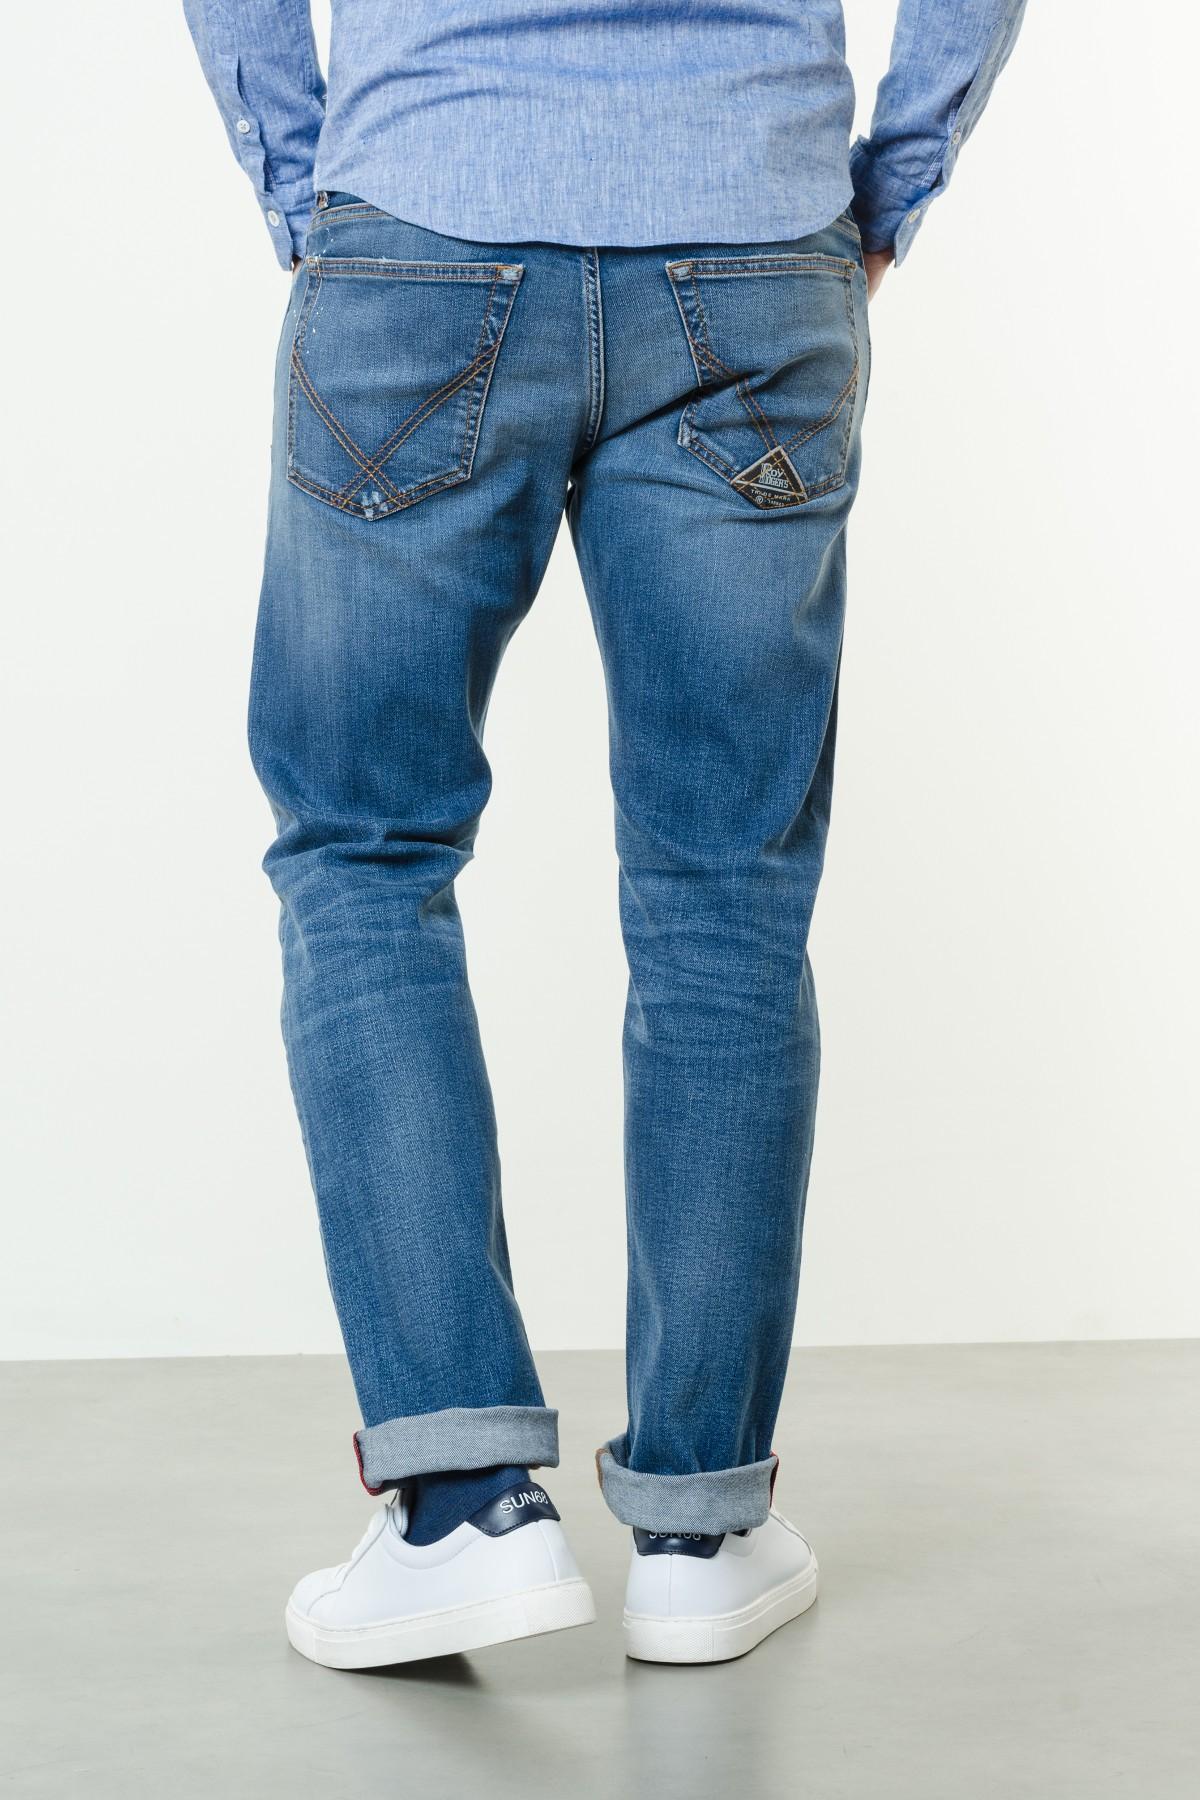 46d126e2fec Jeans for man ROY ROGER'S S/S17 - Rione Fontana